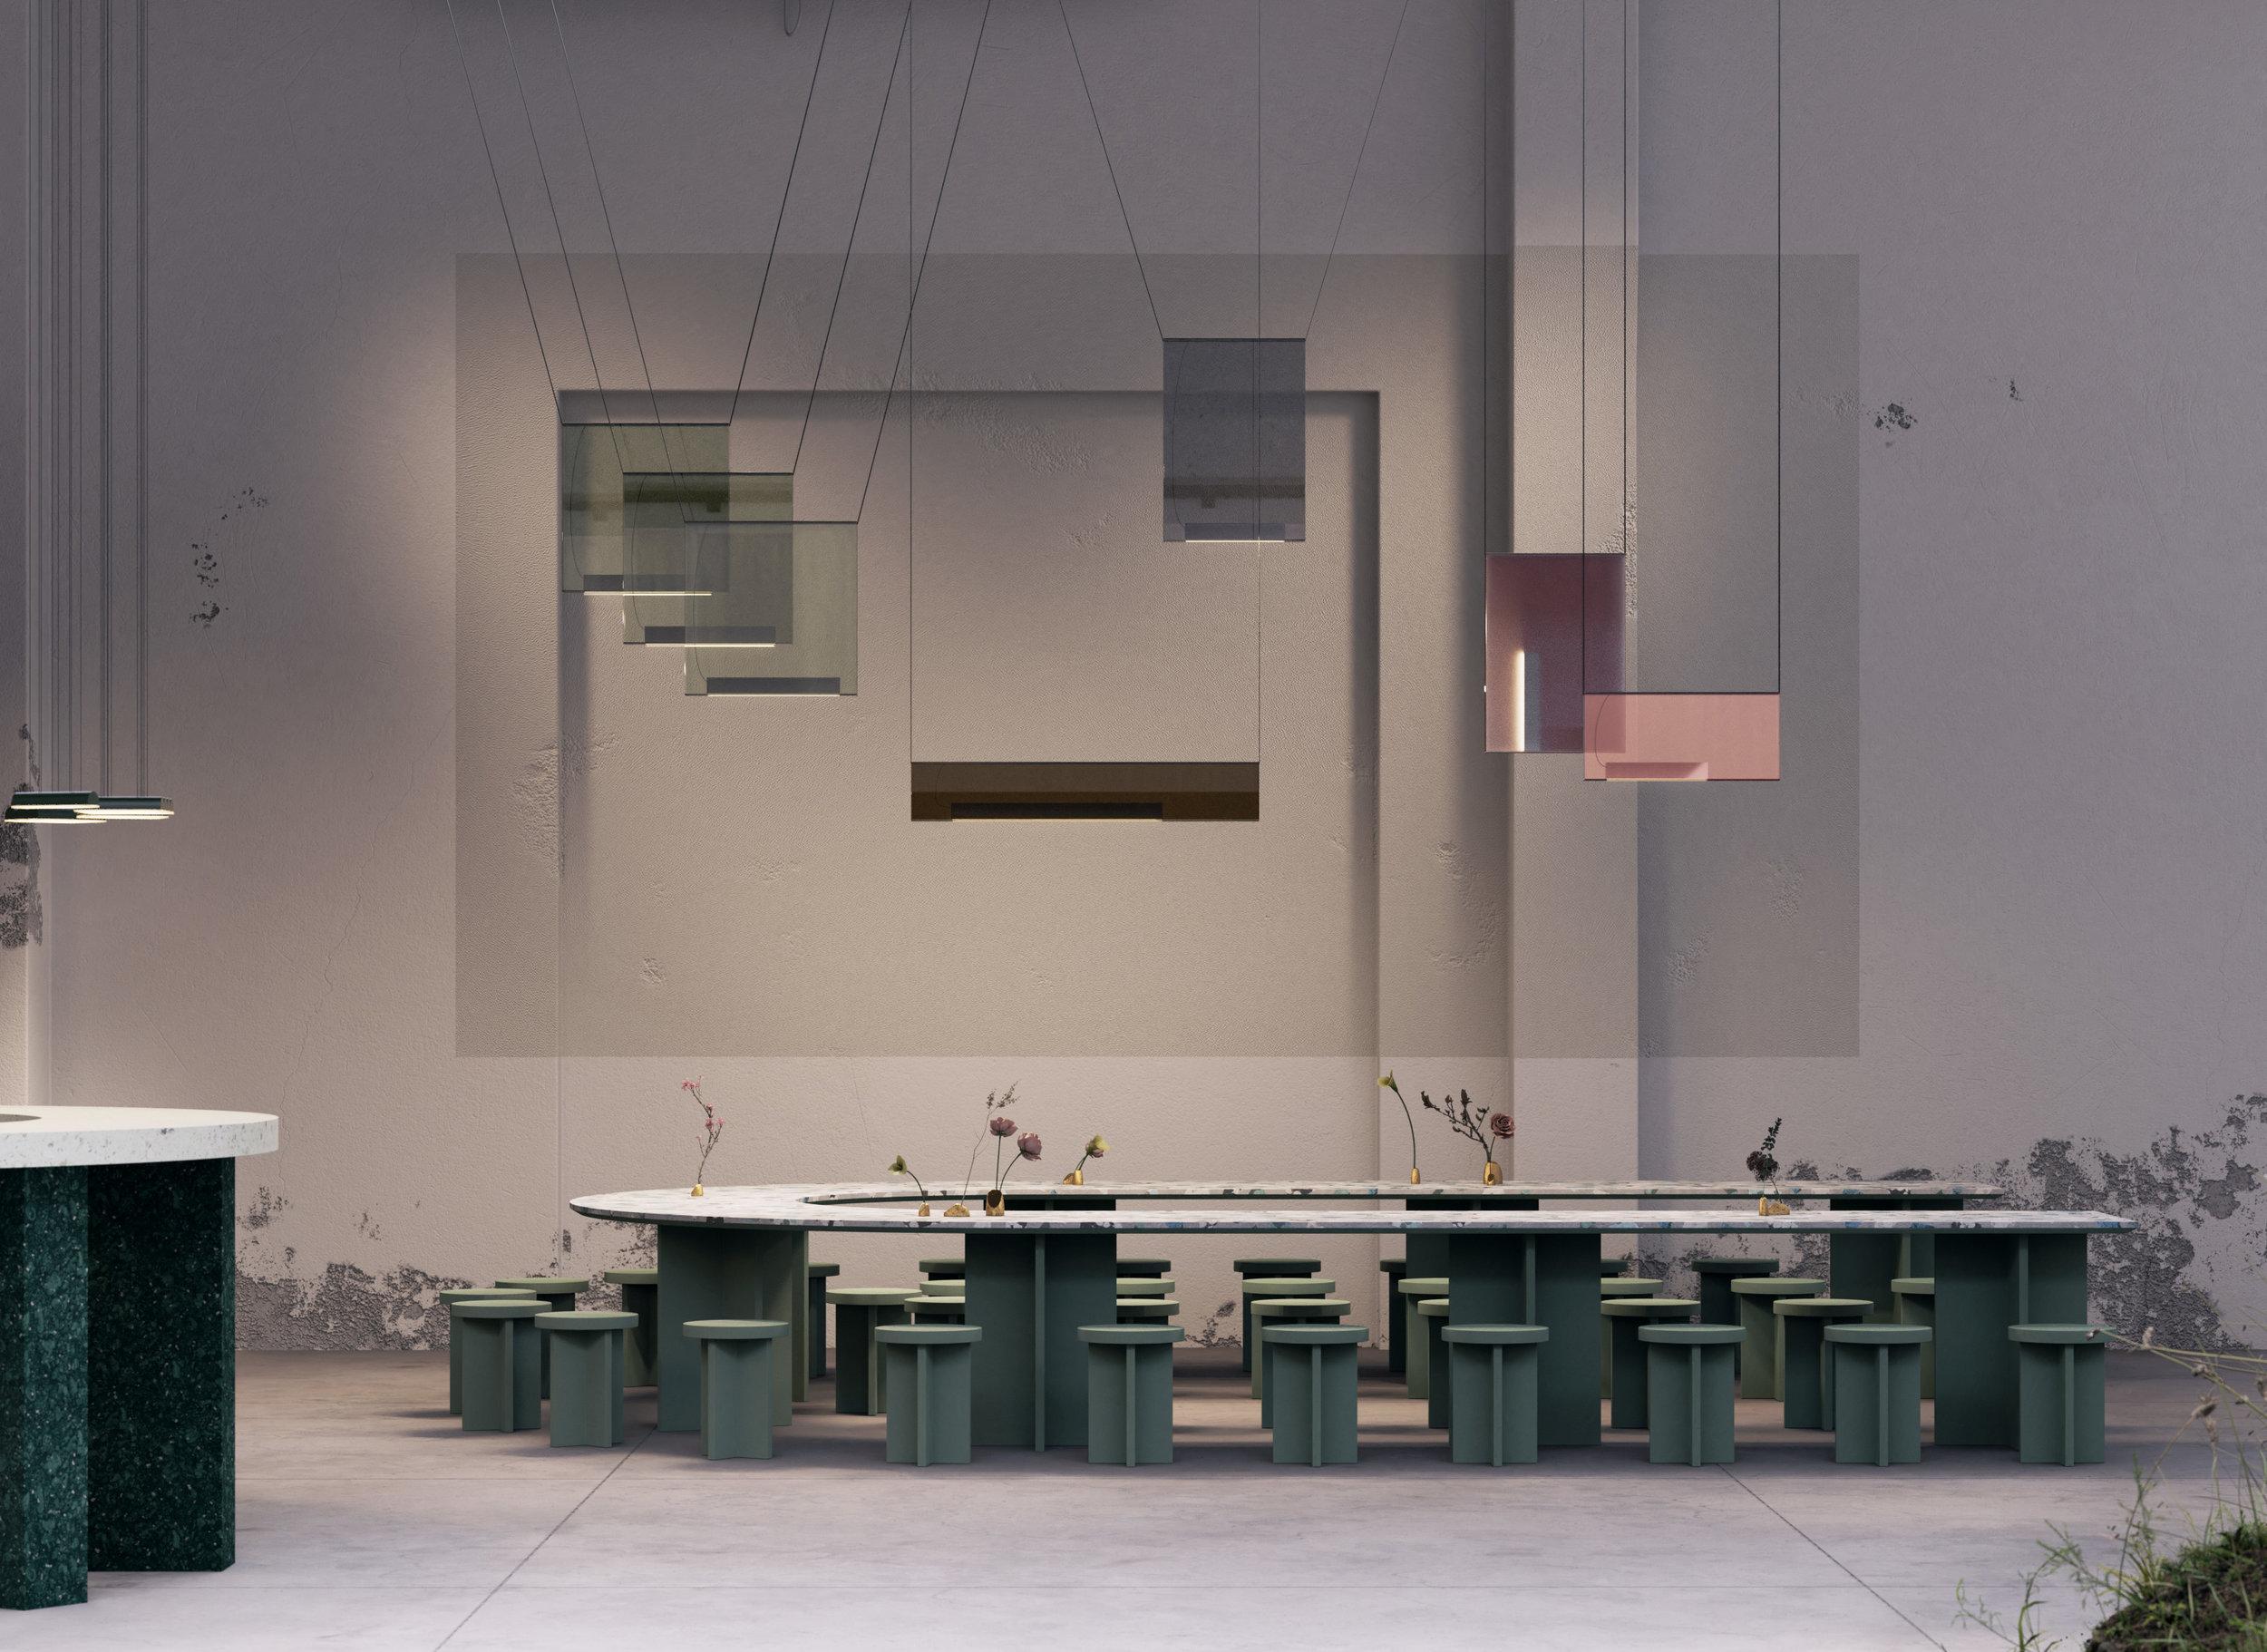 LAMBERT & FILS + DWA DESIGN STUDIO